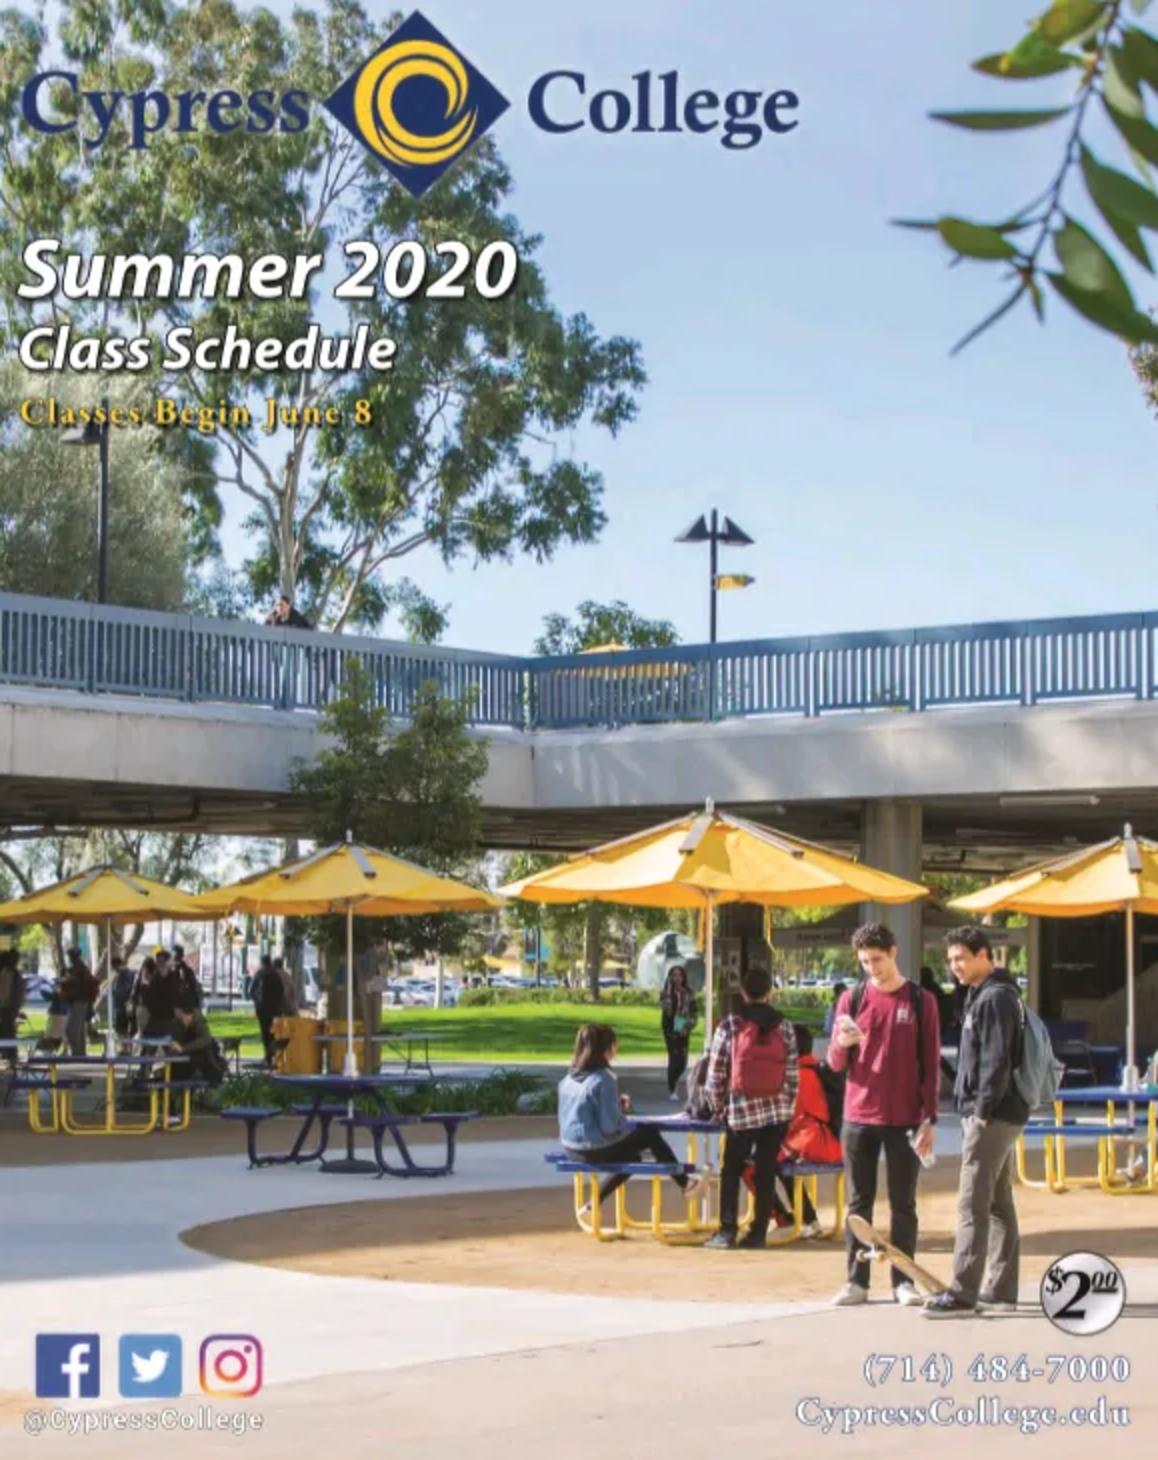 Summer 2020 Class Schedule Cover